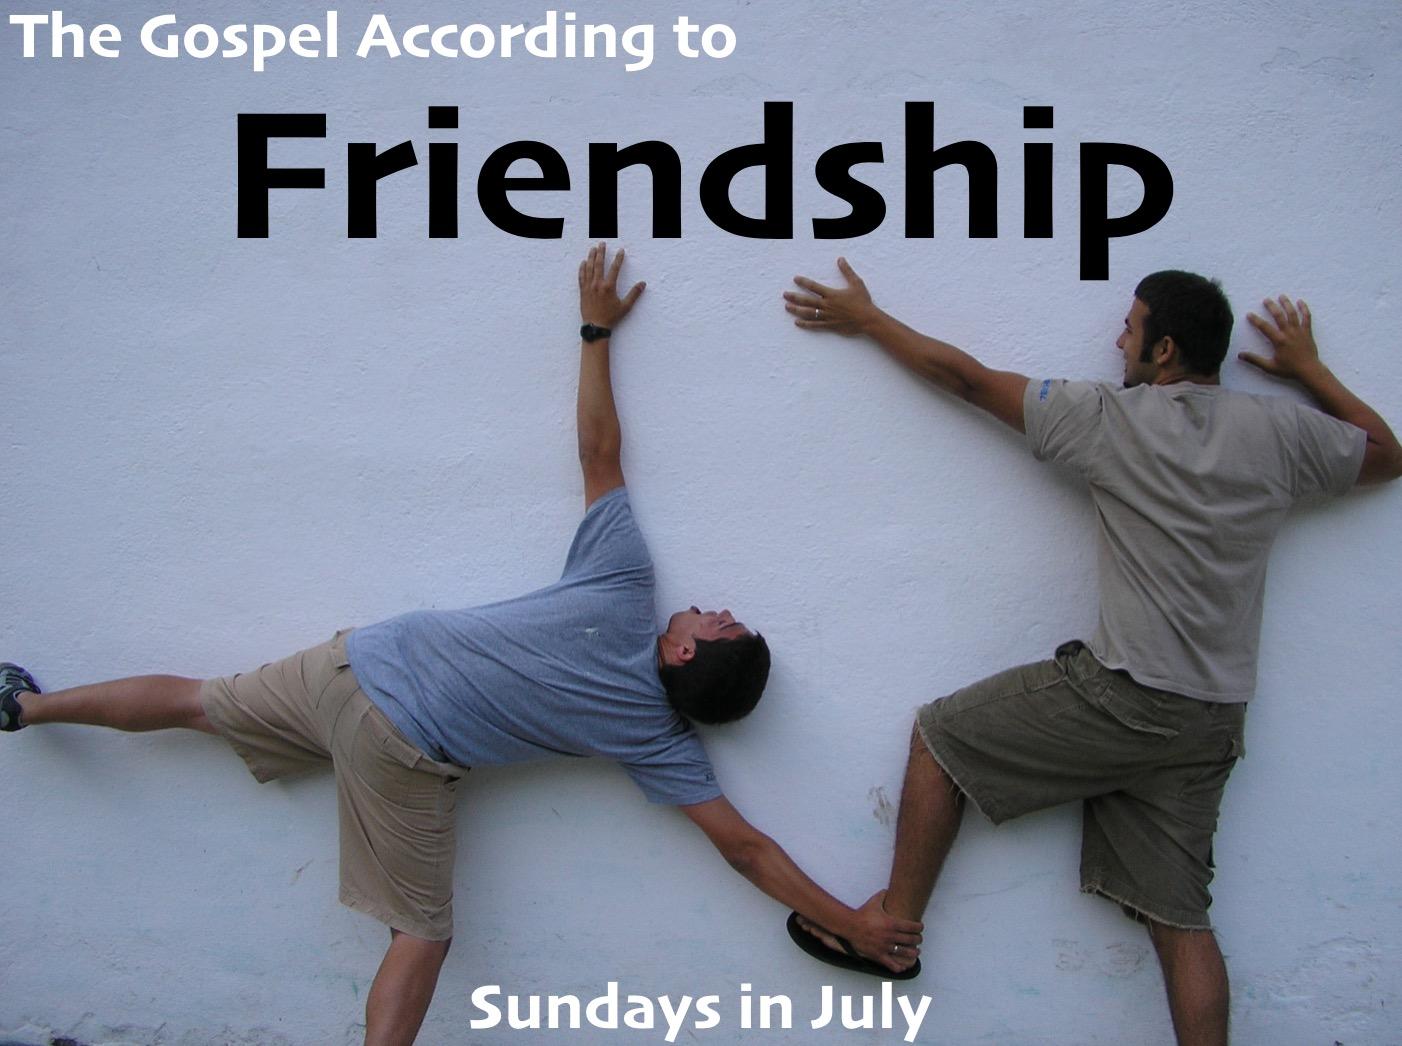 Sundays in July - The Gospel According to Friendship.jpg